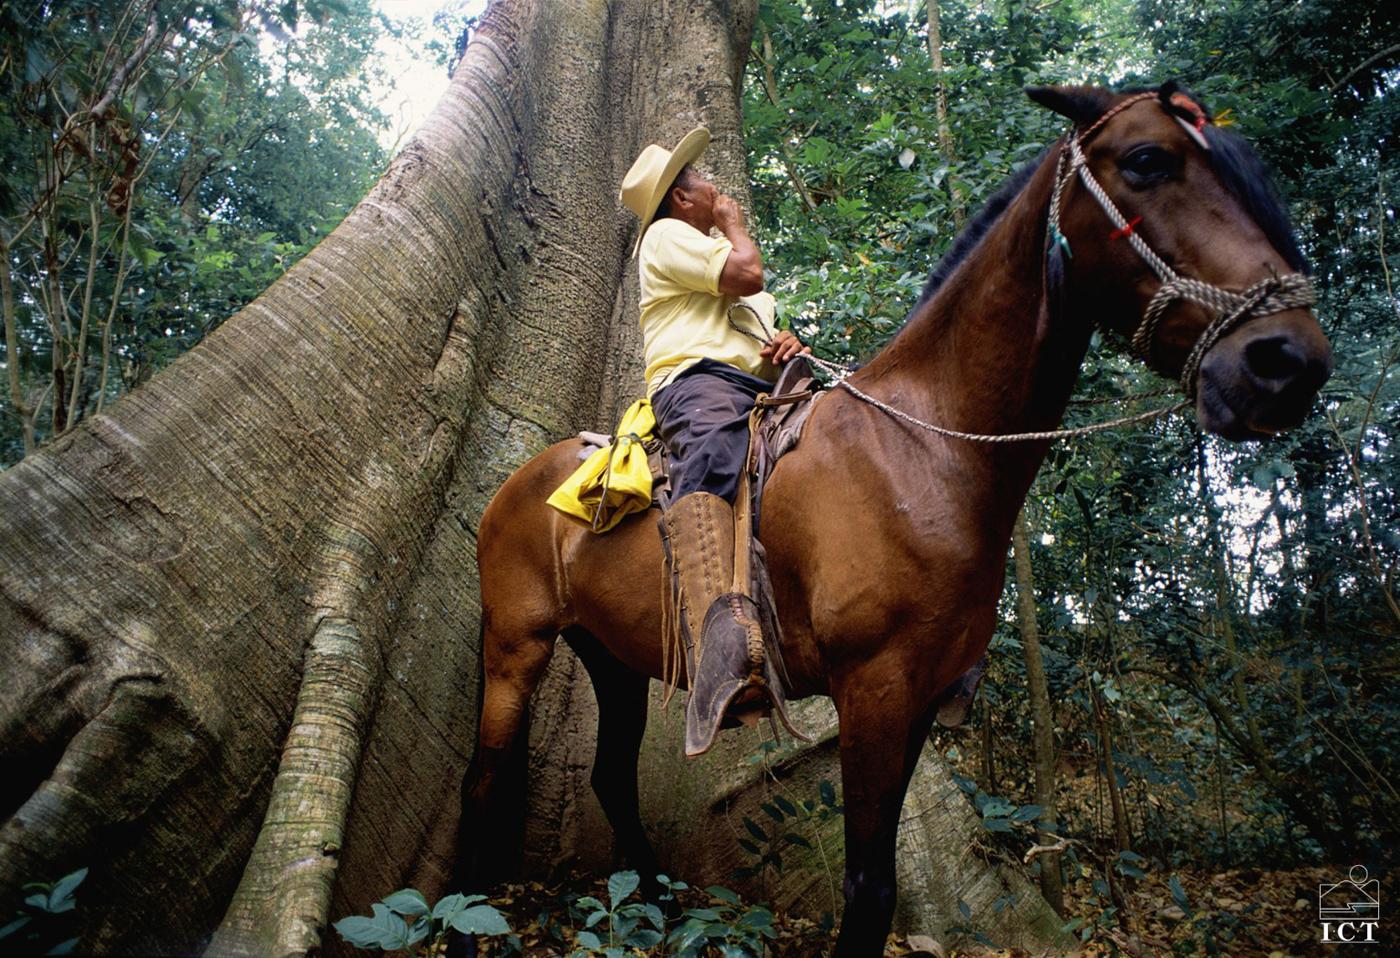 cos02-horse-ride-to-la-fortuna-falls-free-ict